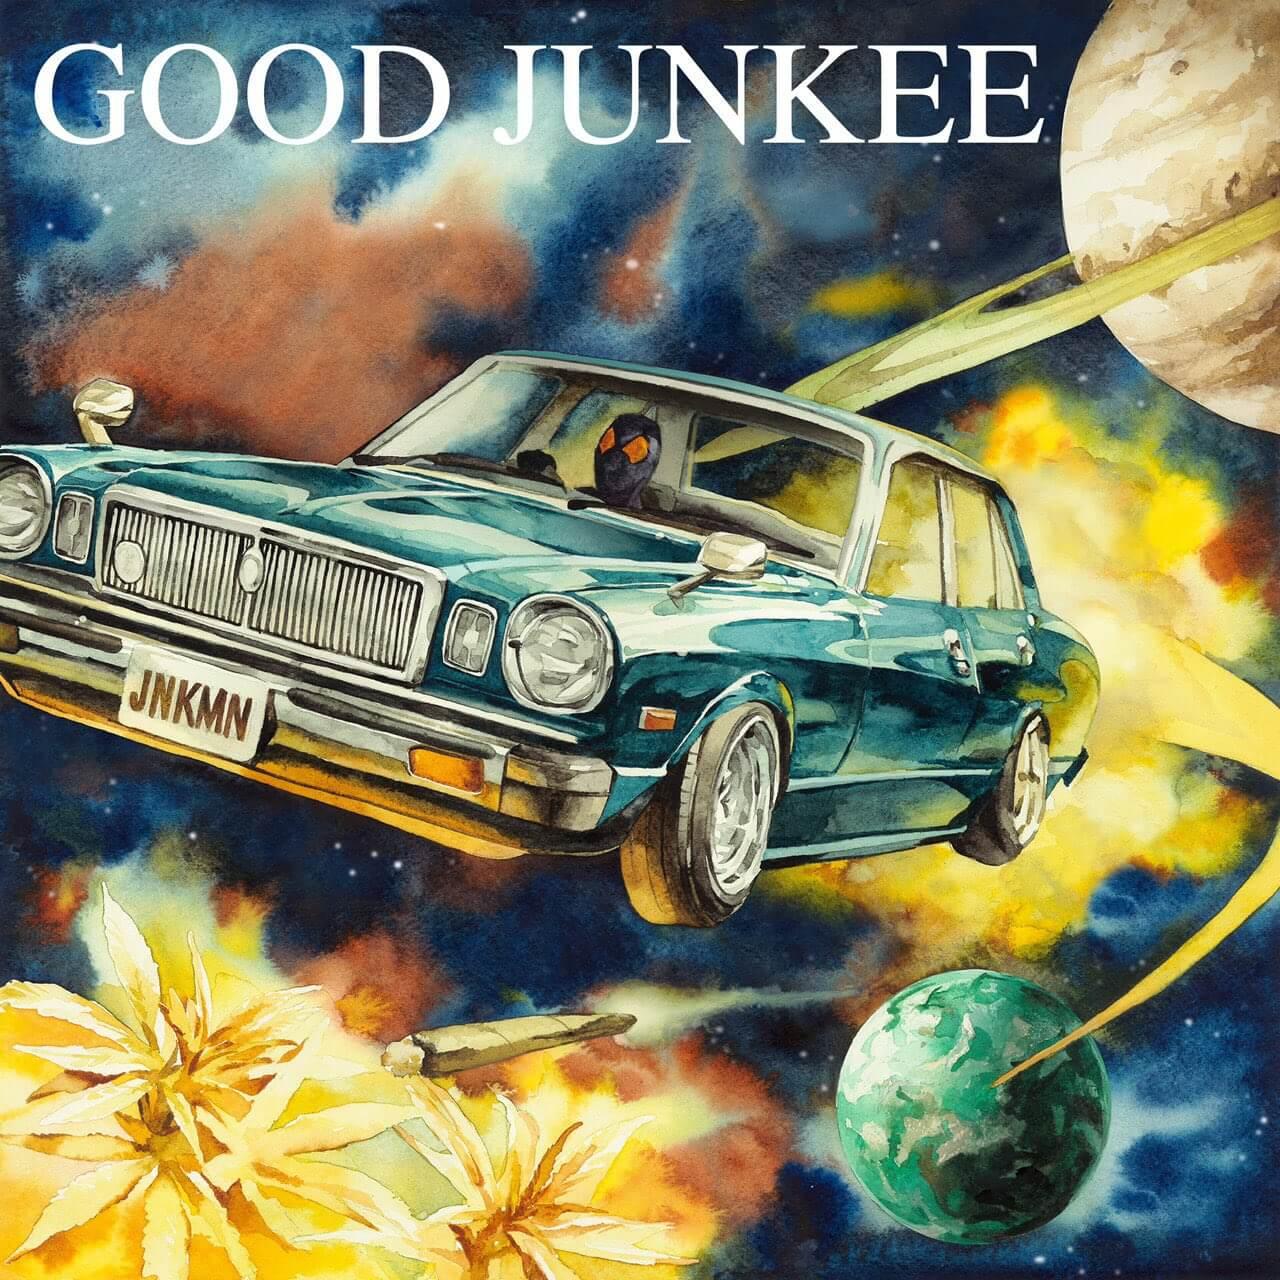 JNKMNが2ndアルバム『GOOD JUNKEE』をリリース|ゆるふわギャングやMonyHorse、Leon Fanourakis、SANTAWORLDVIEW、TAEYOらが参加 music210222-jnkmn-good-junkee